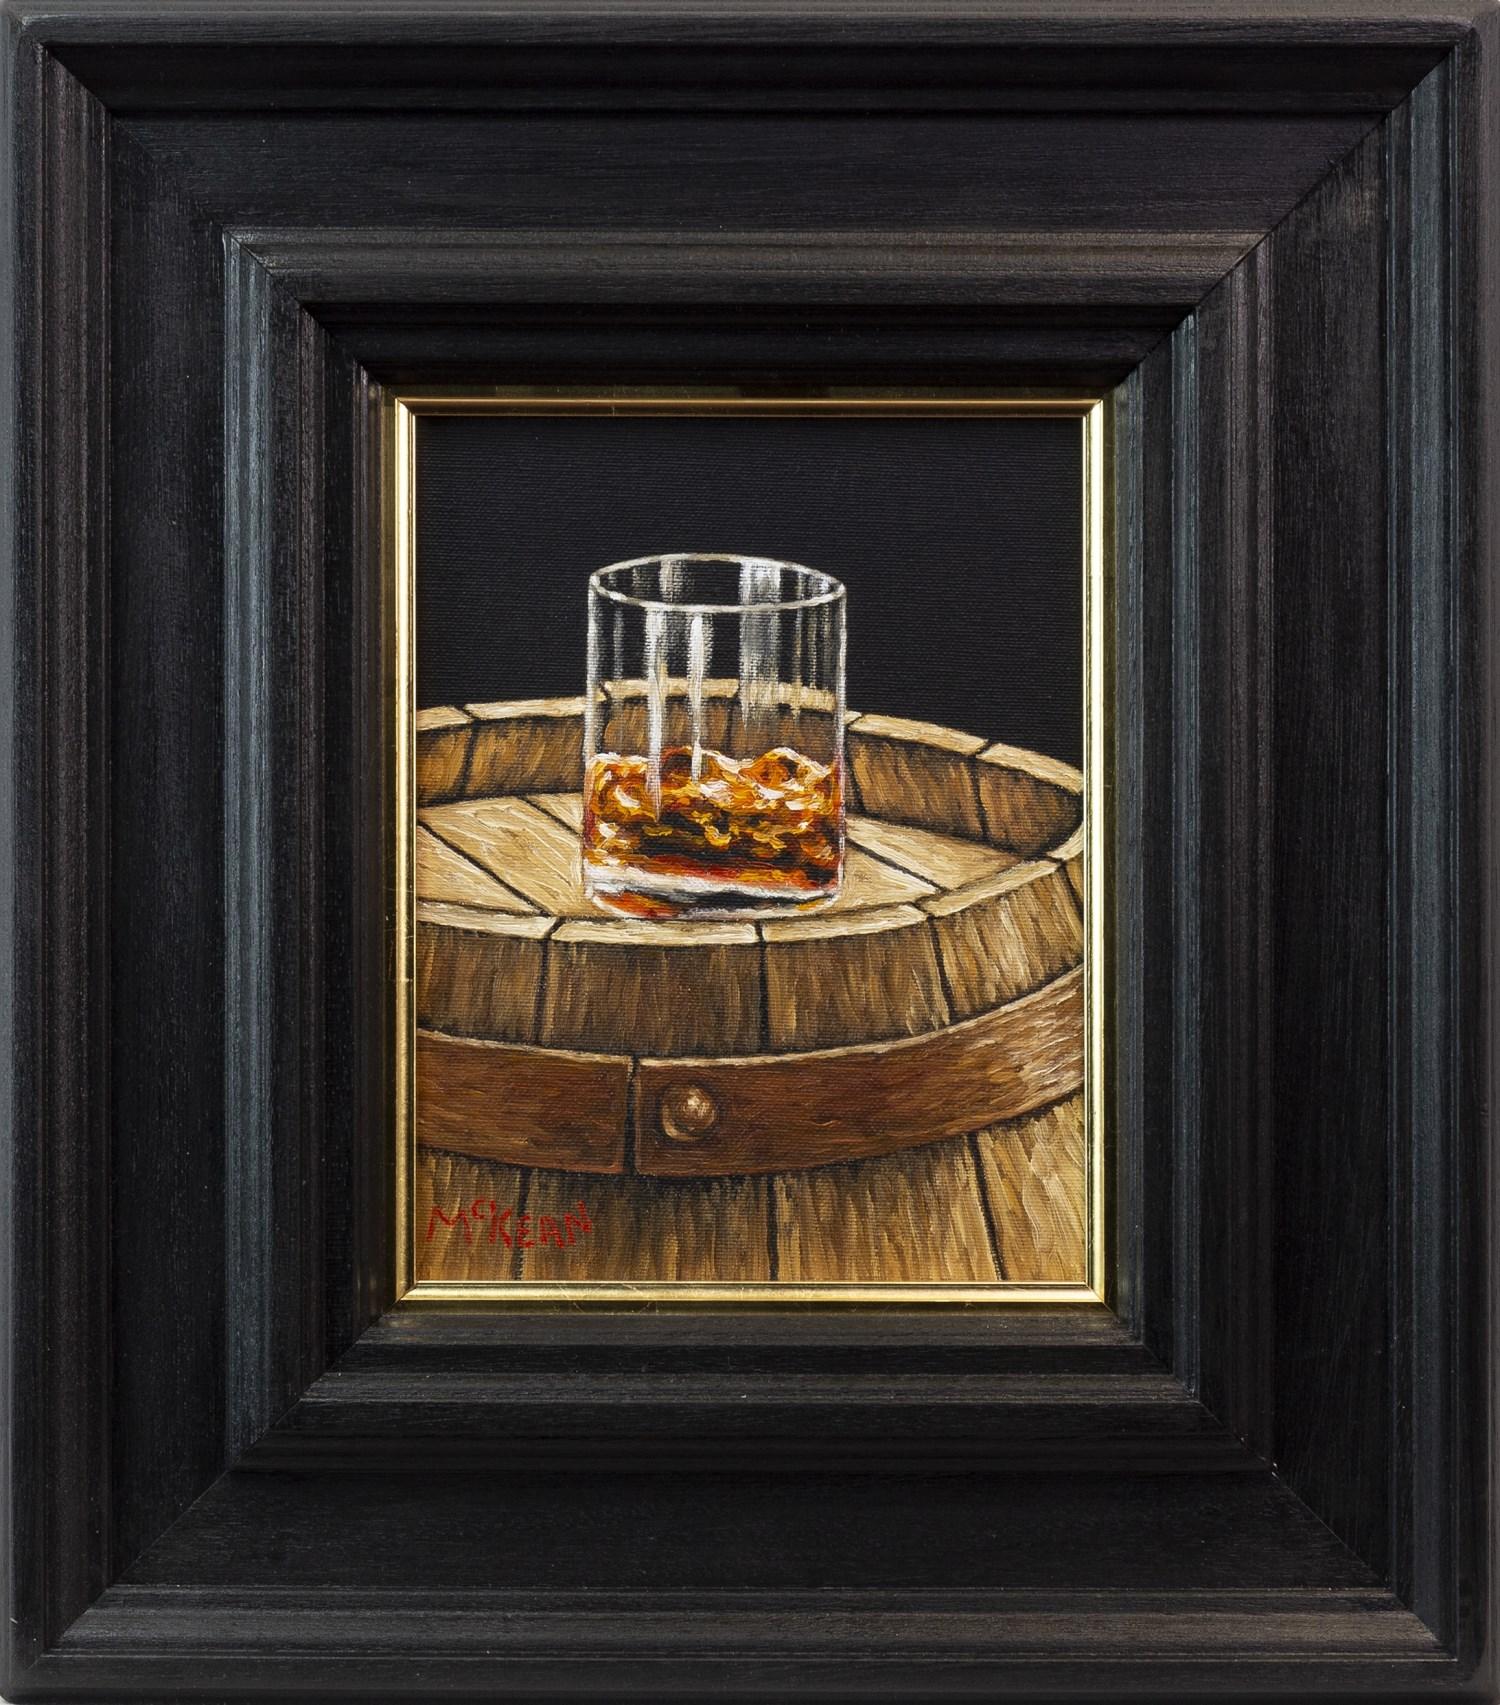 Lot 40 - A SINGLE CASK MALT, AN OIL ON CANVAS BY GRAHAM MCKEAN